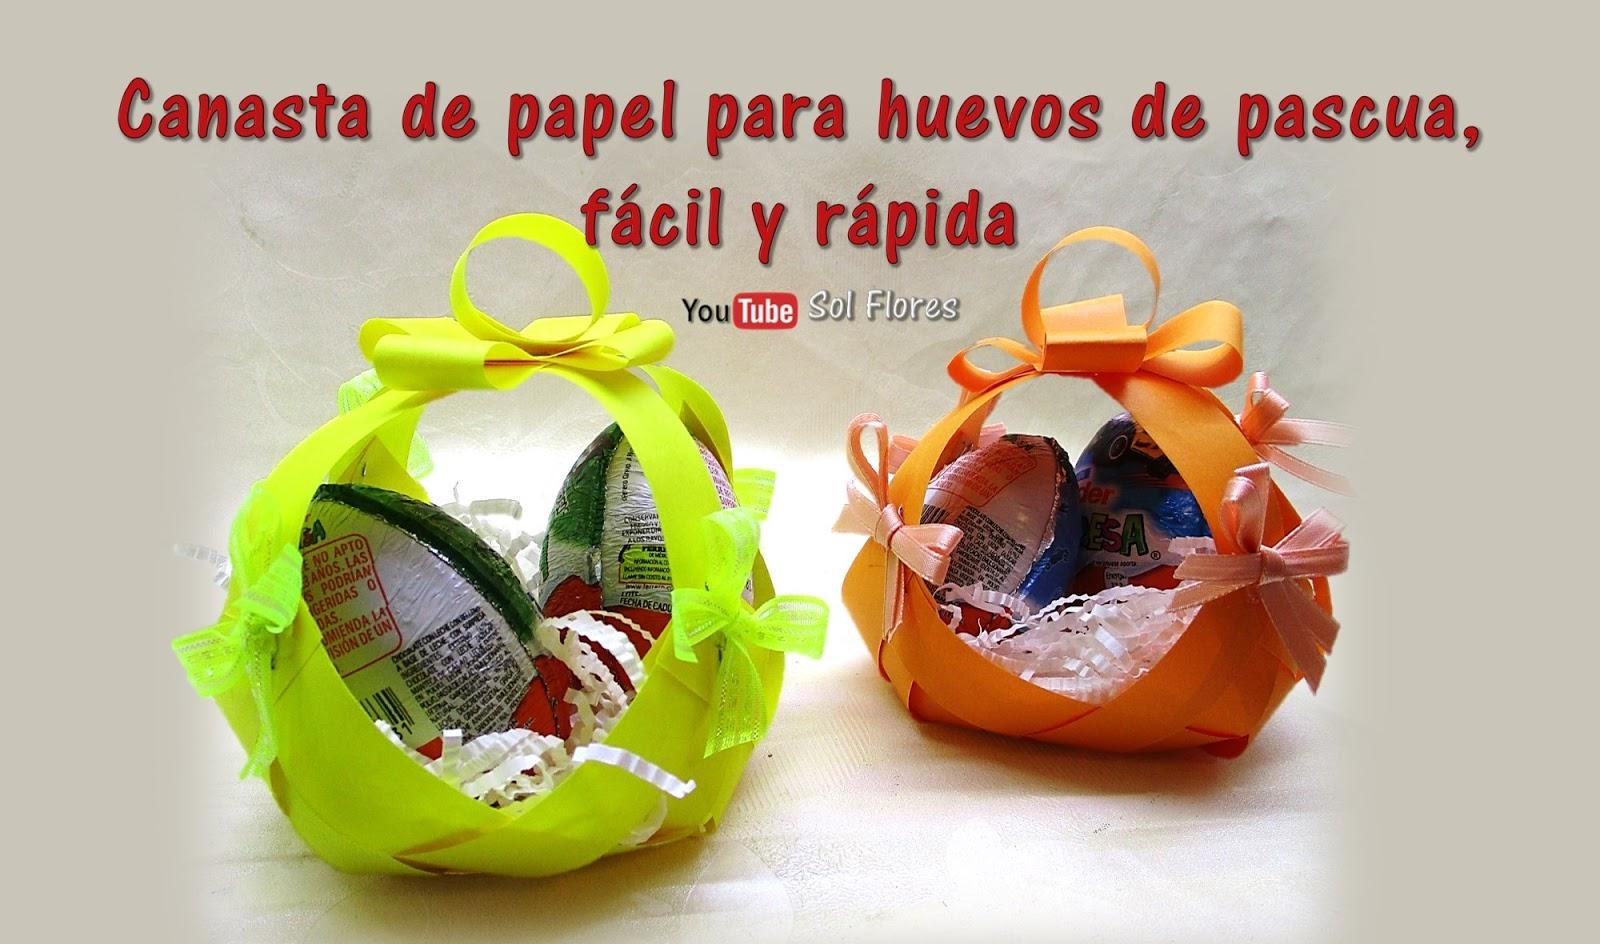 Canasta Para Huevos Manualidades.Canasta De Papel Para Huevos De Pascua Facil Y Rapida